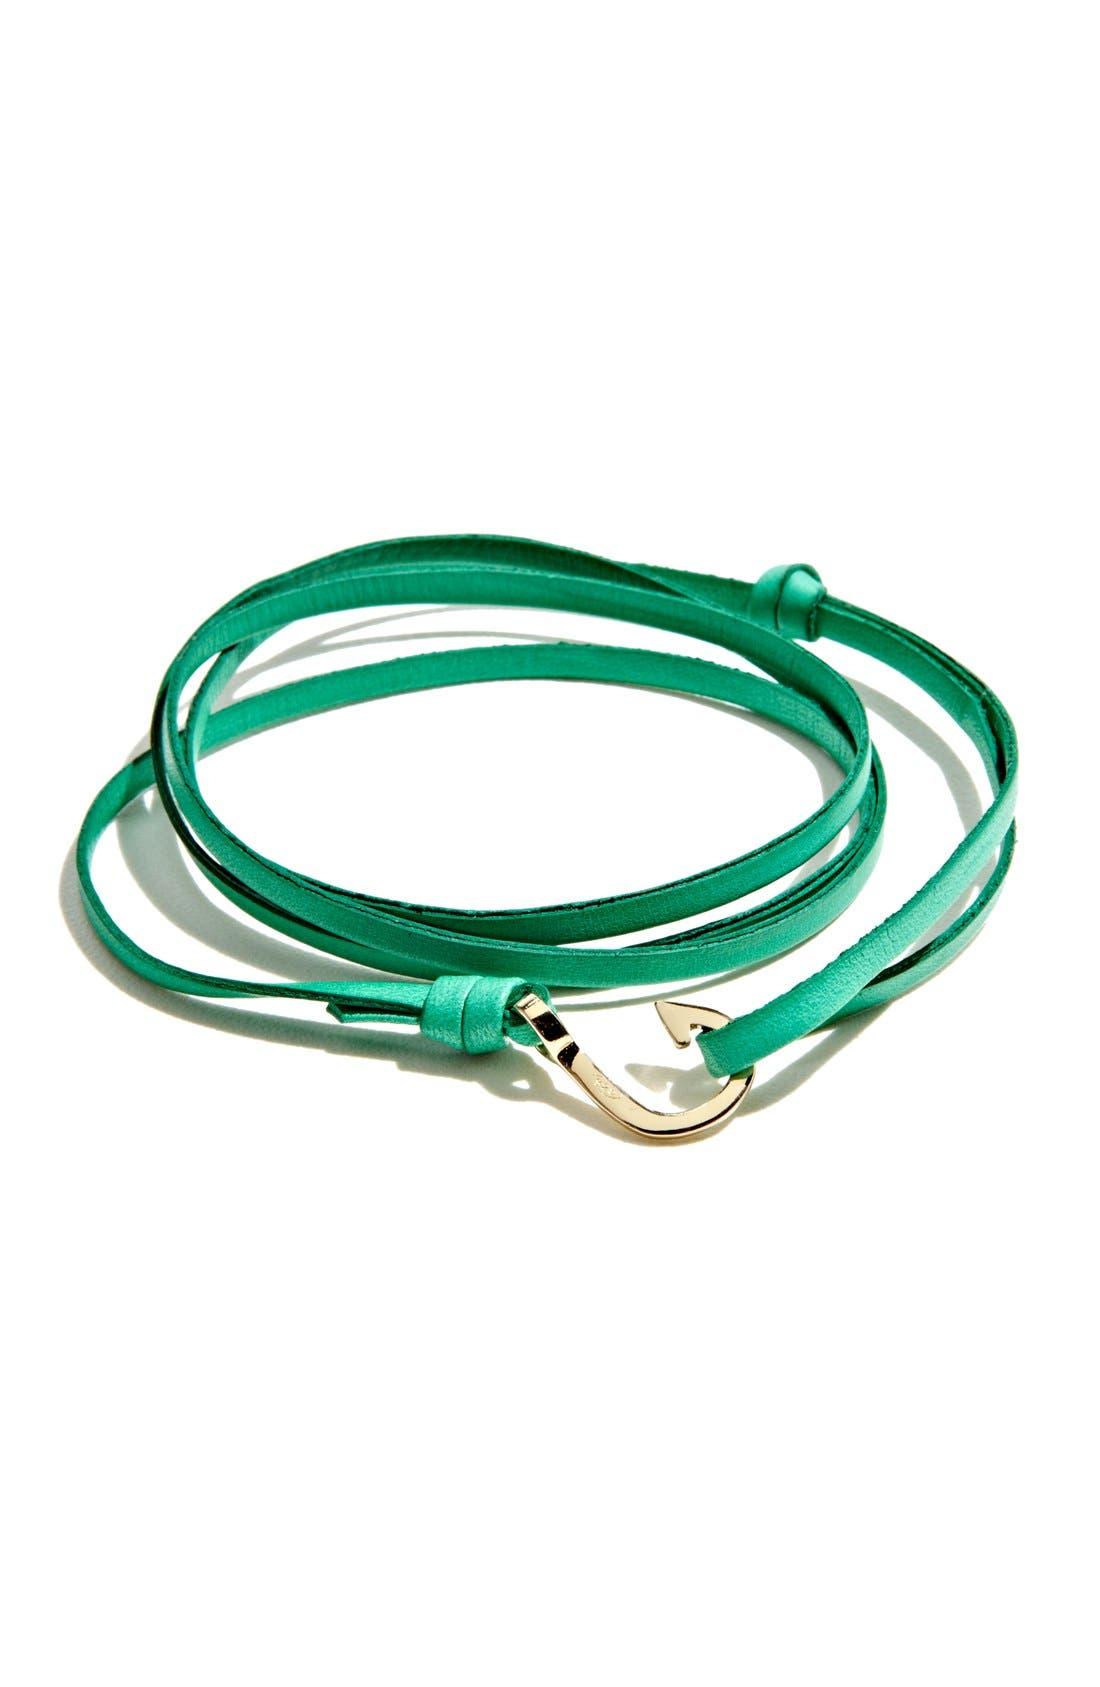 Main Image - Miansai Gold Mini Hook Leather Bracelet